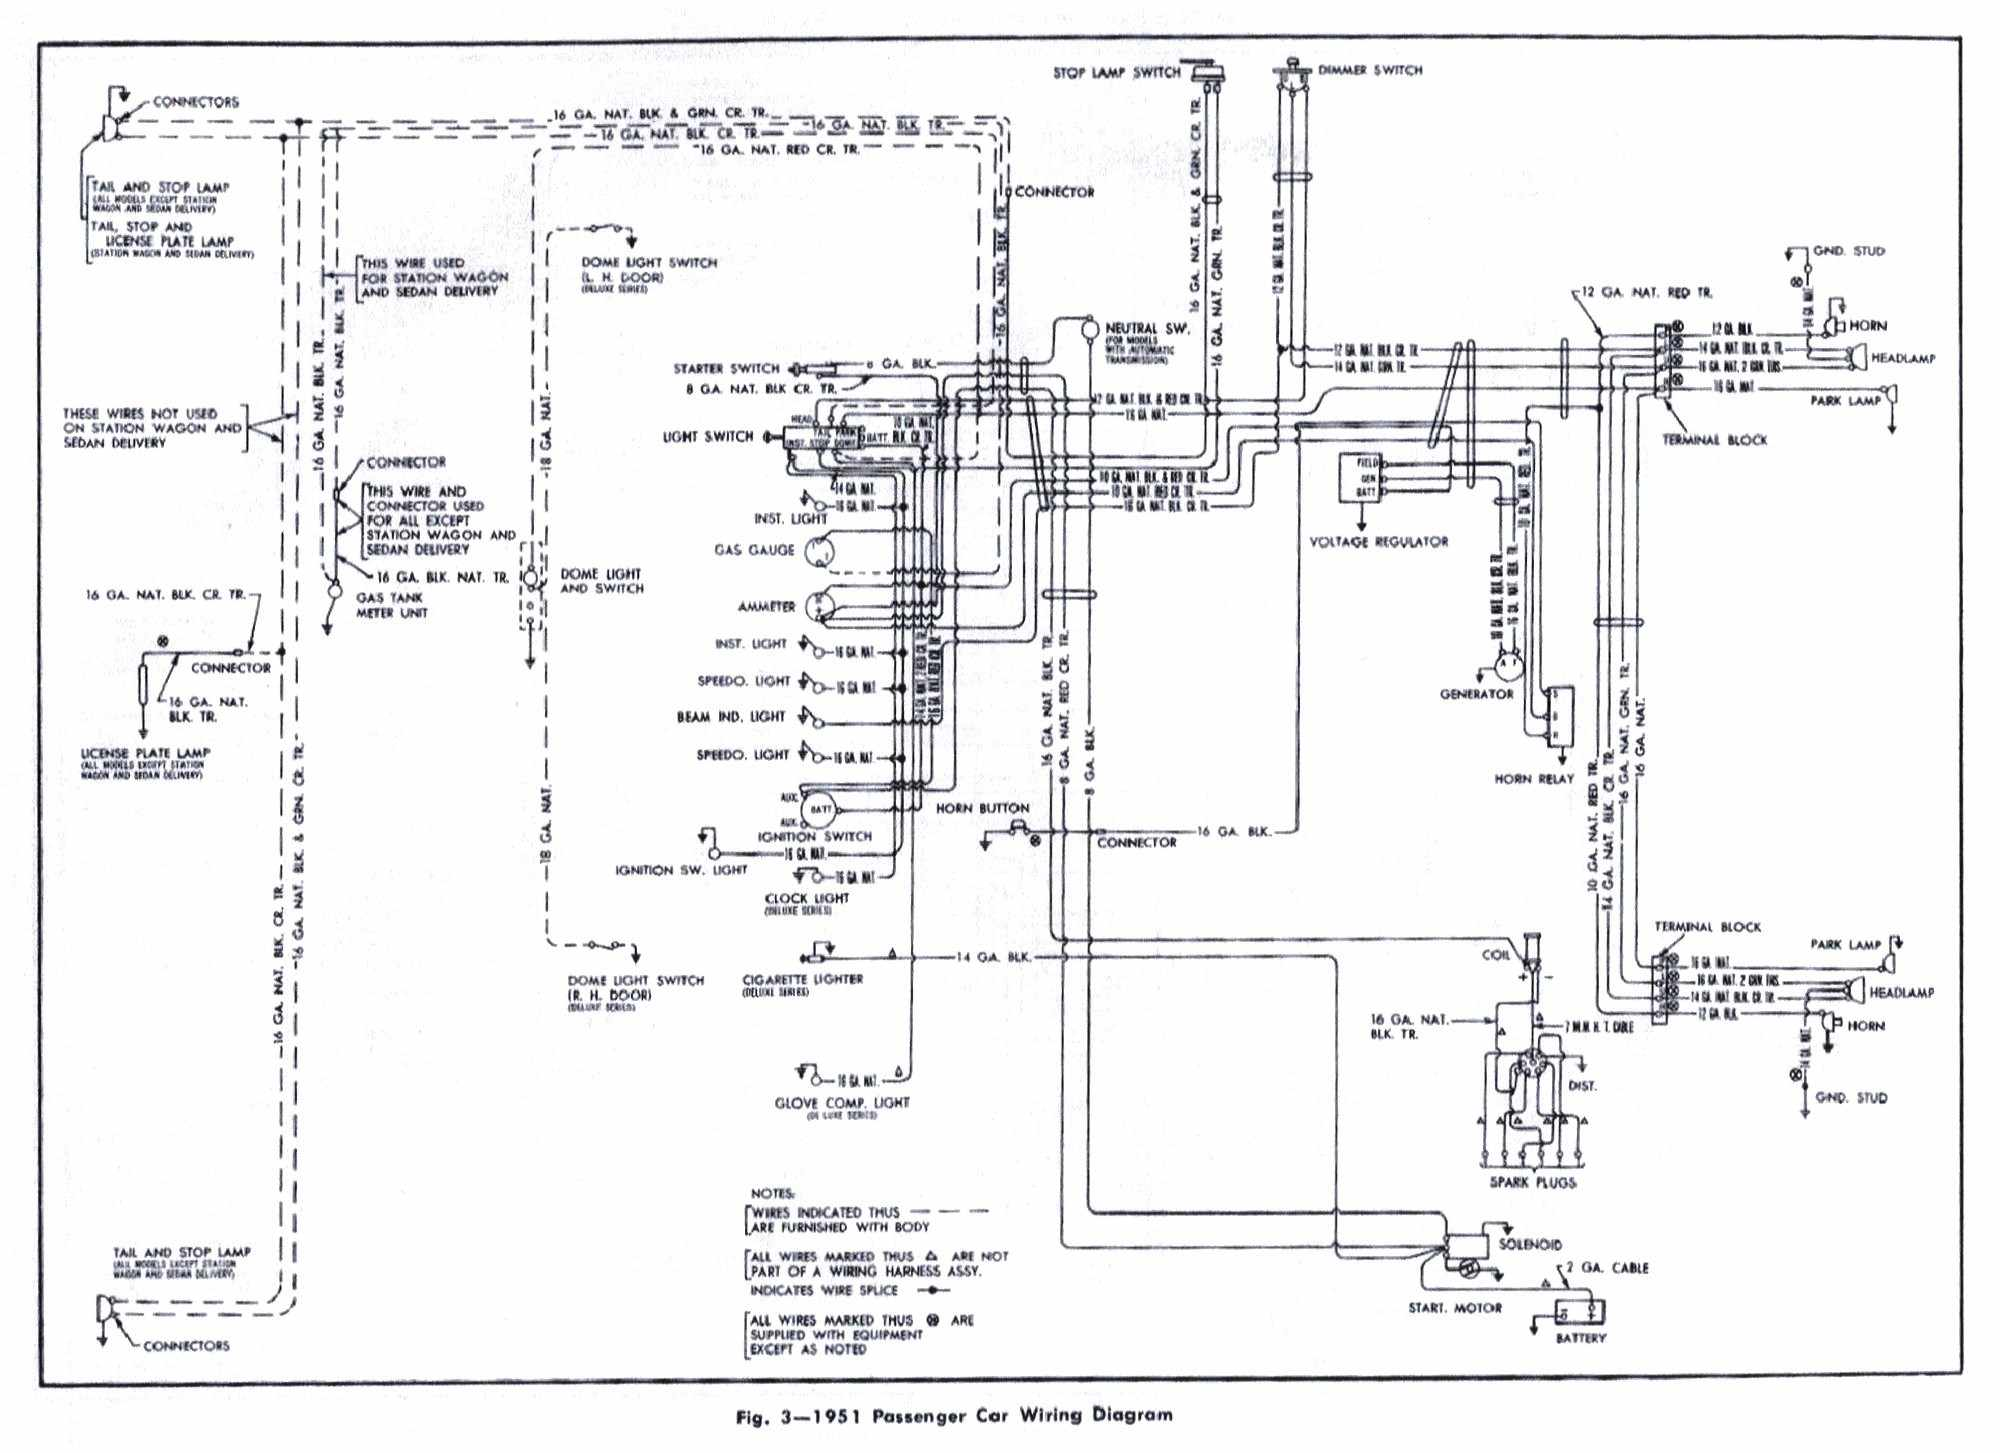 1968 olds 442 wiring diagram